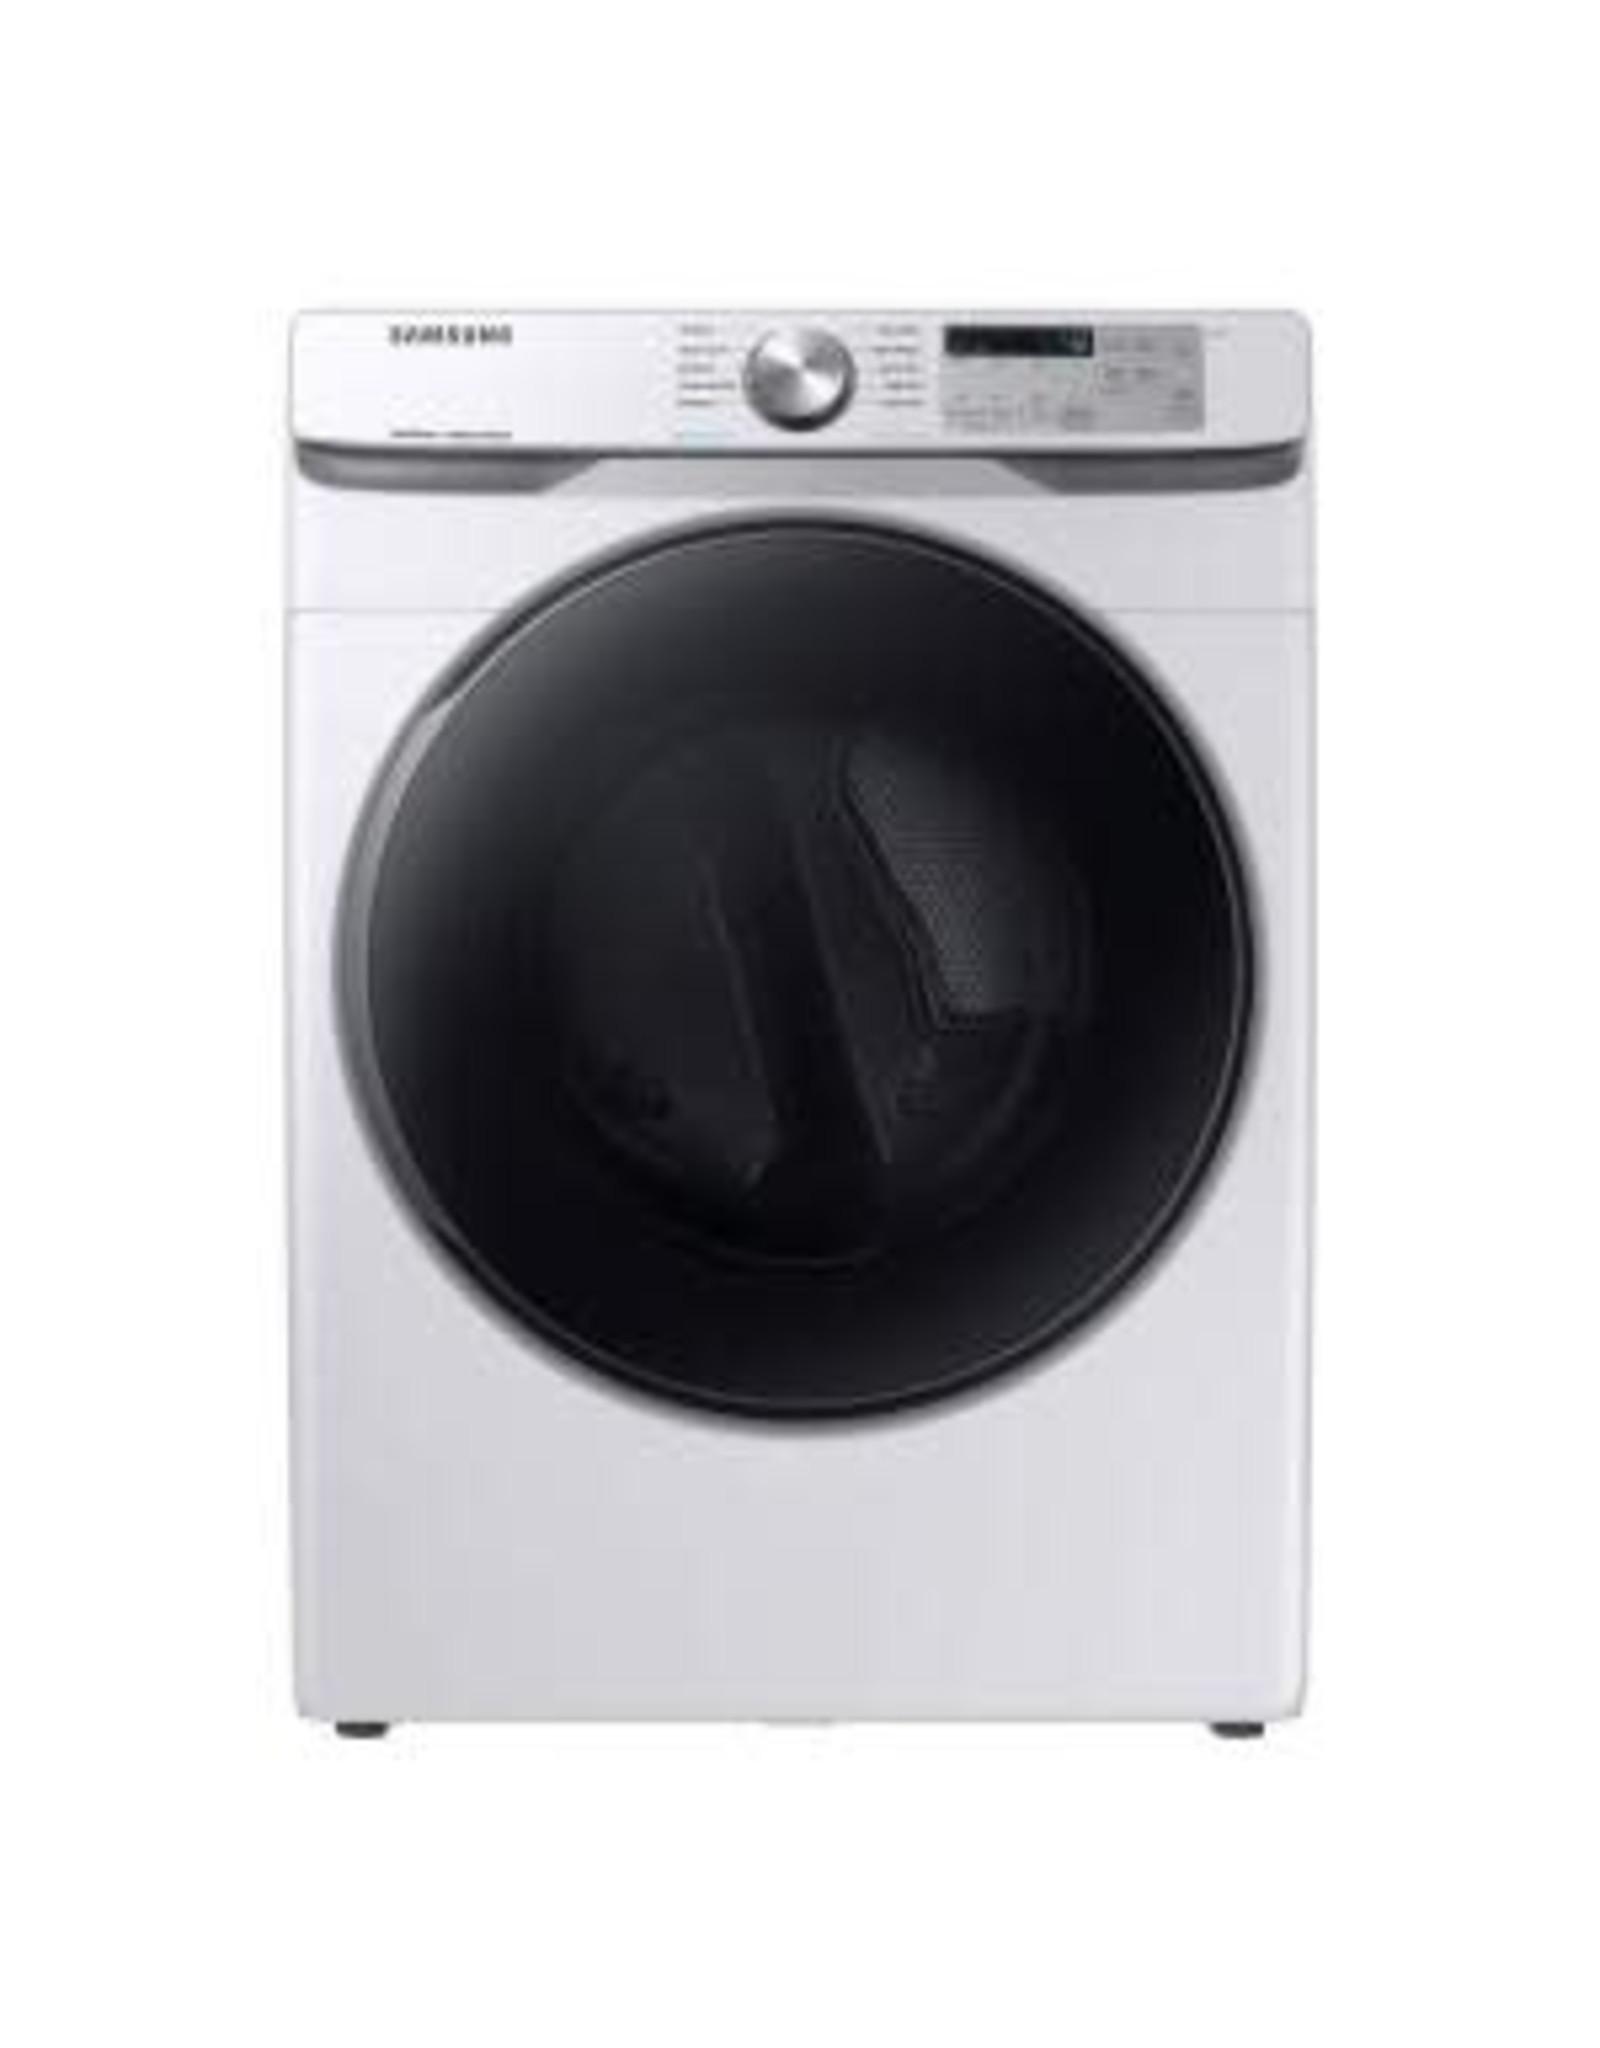 SAMSUNG DVE45R6100W /  016075/ 7.5 cu. ft. White Electric Dryer with Steam